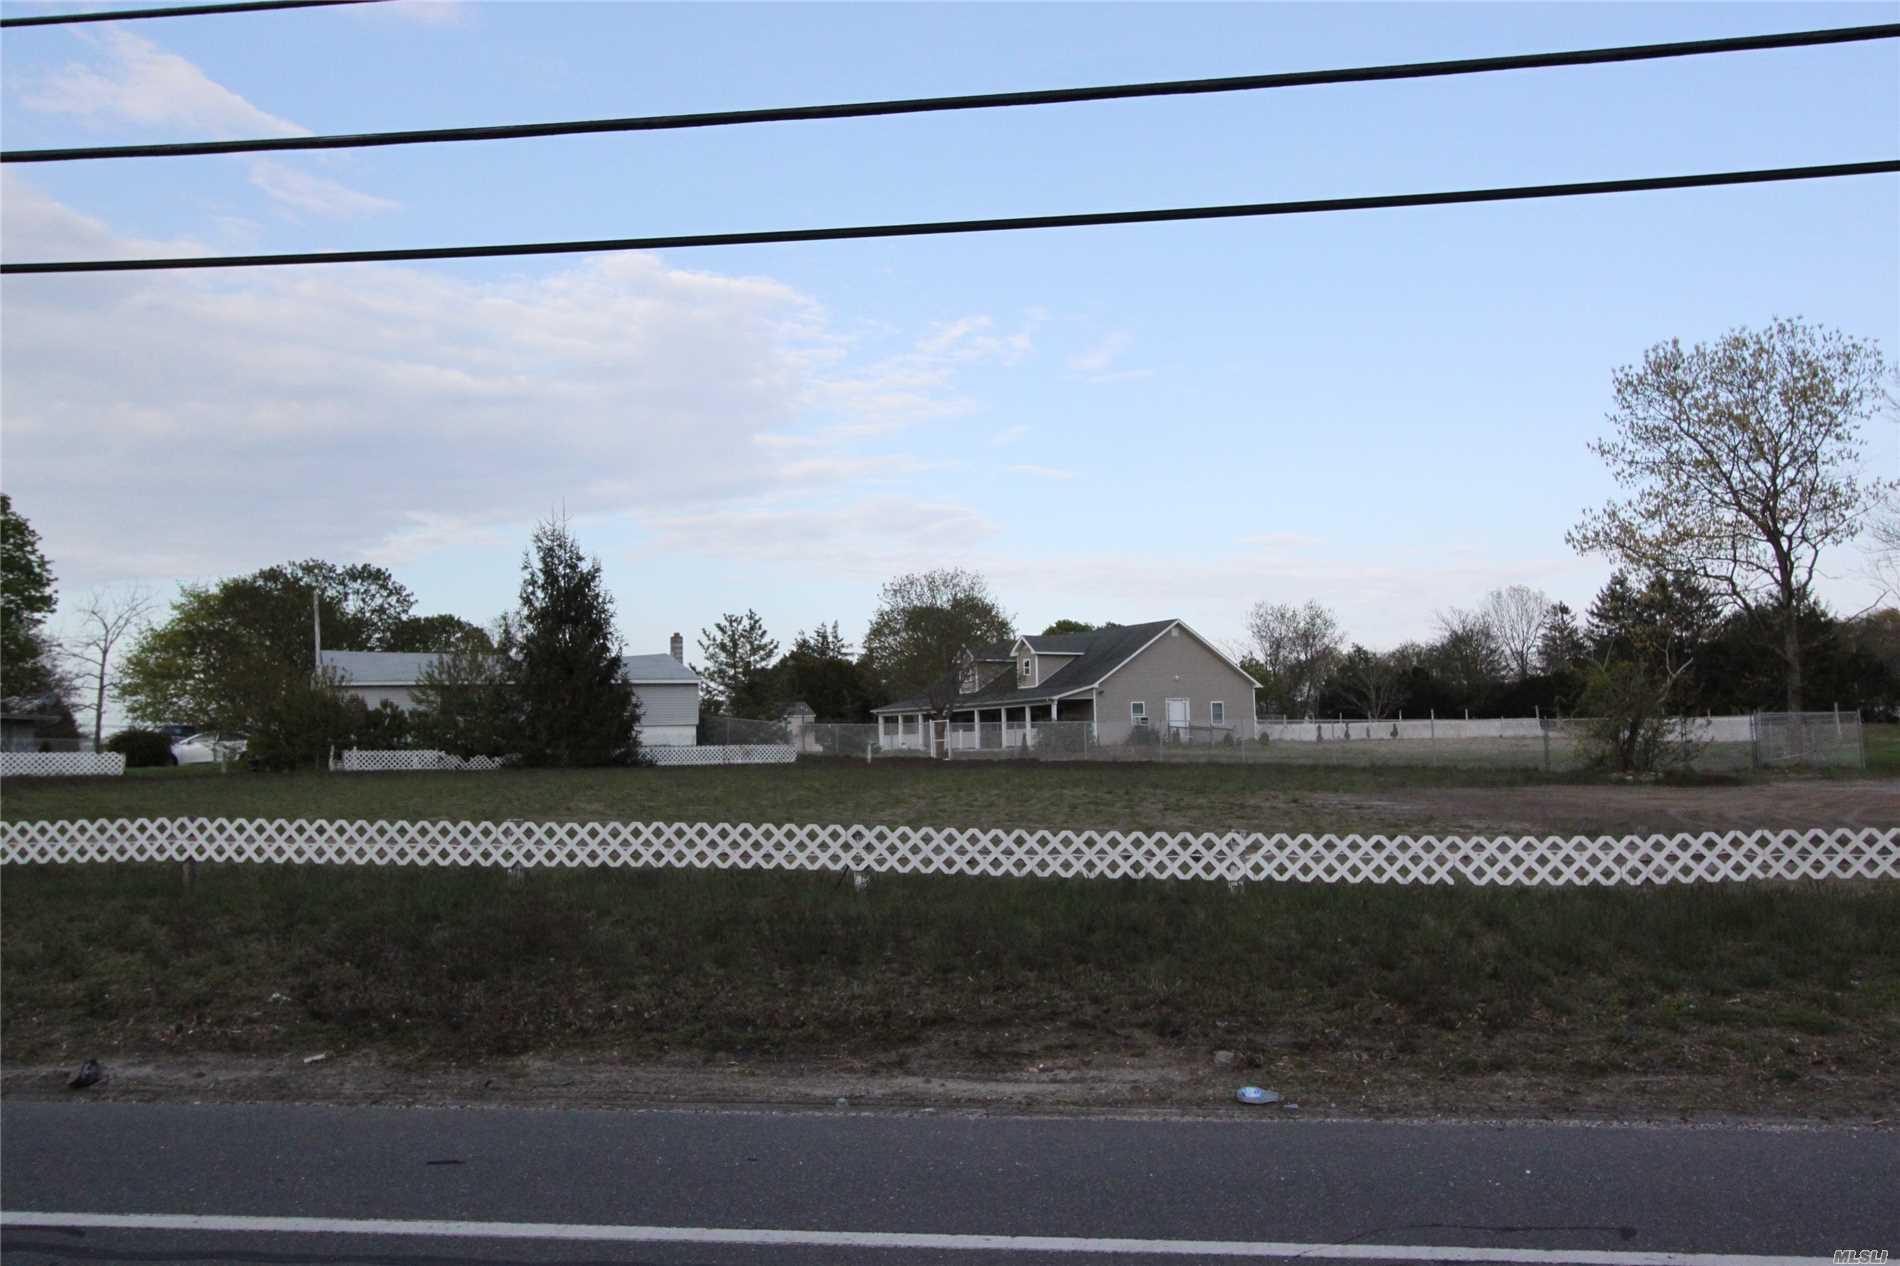 1155 Northville Tpke - Riverhead, New York